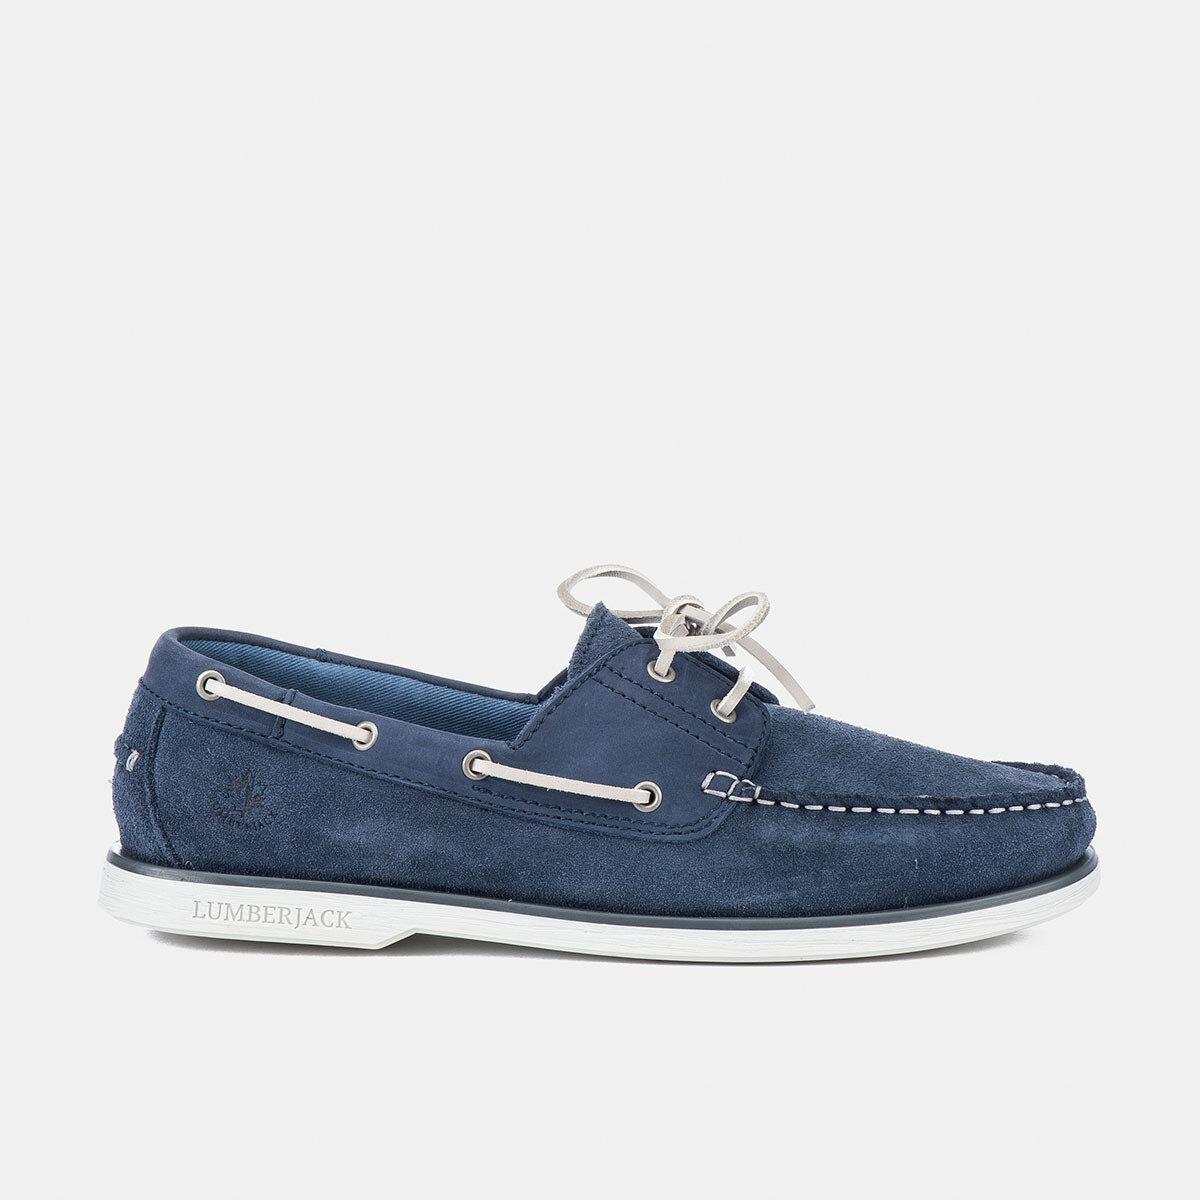 NAVIGATOR MOOD INDIGO BLUE Man Boat shoes